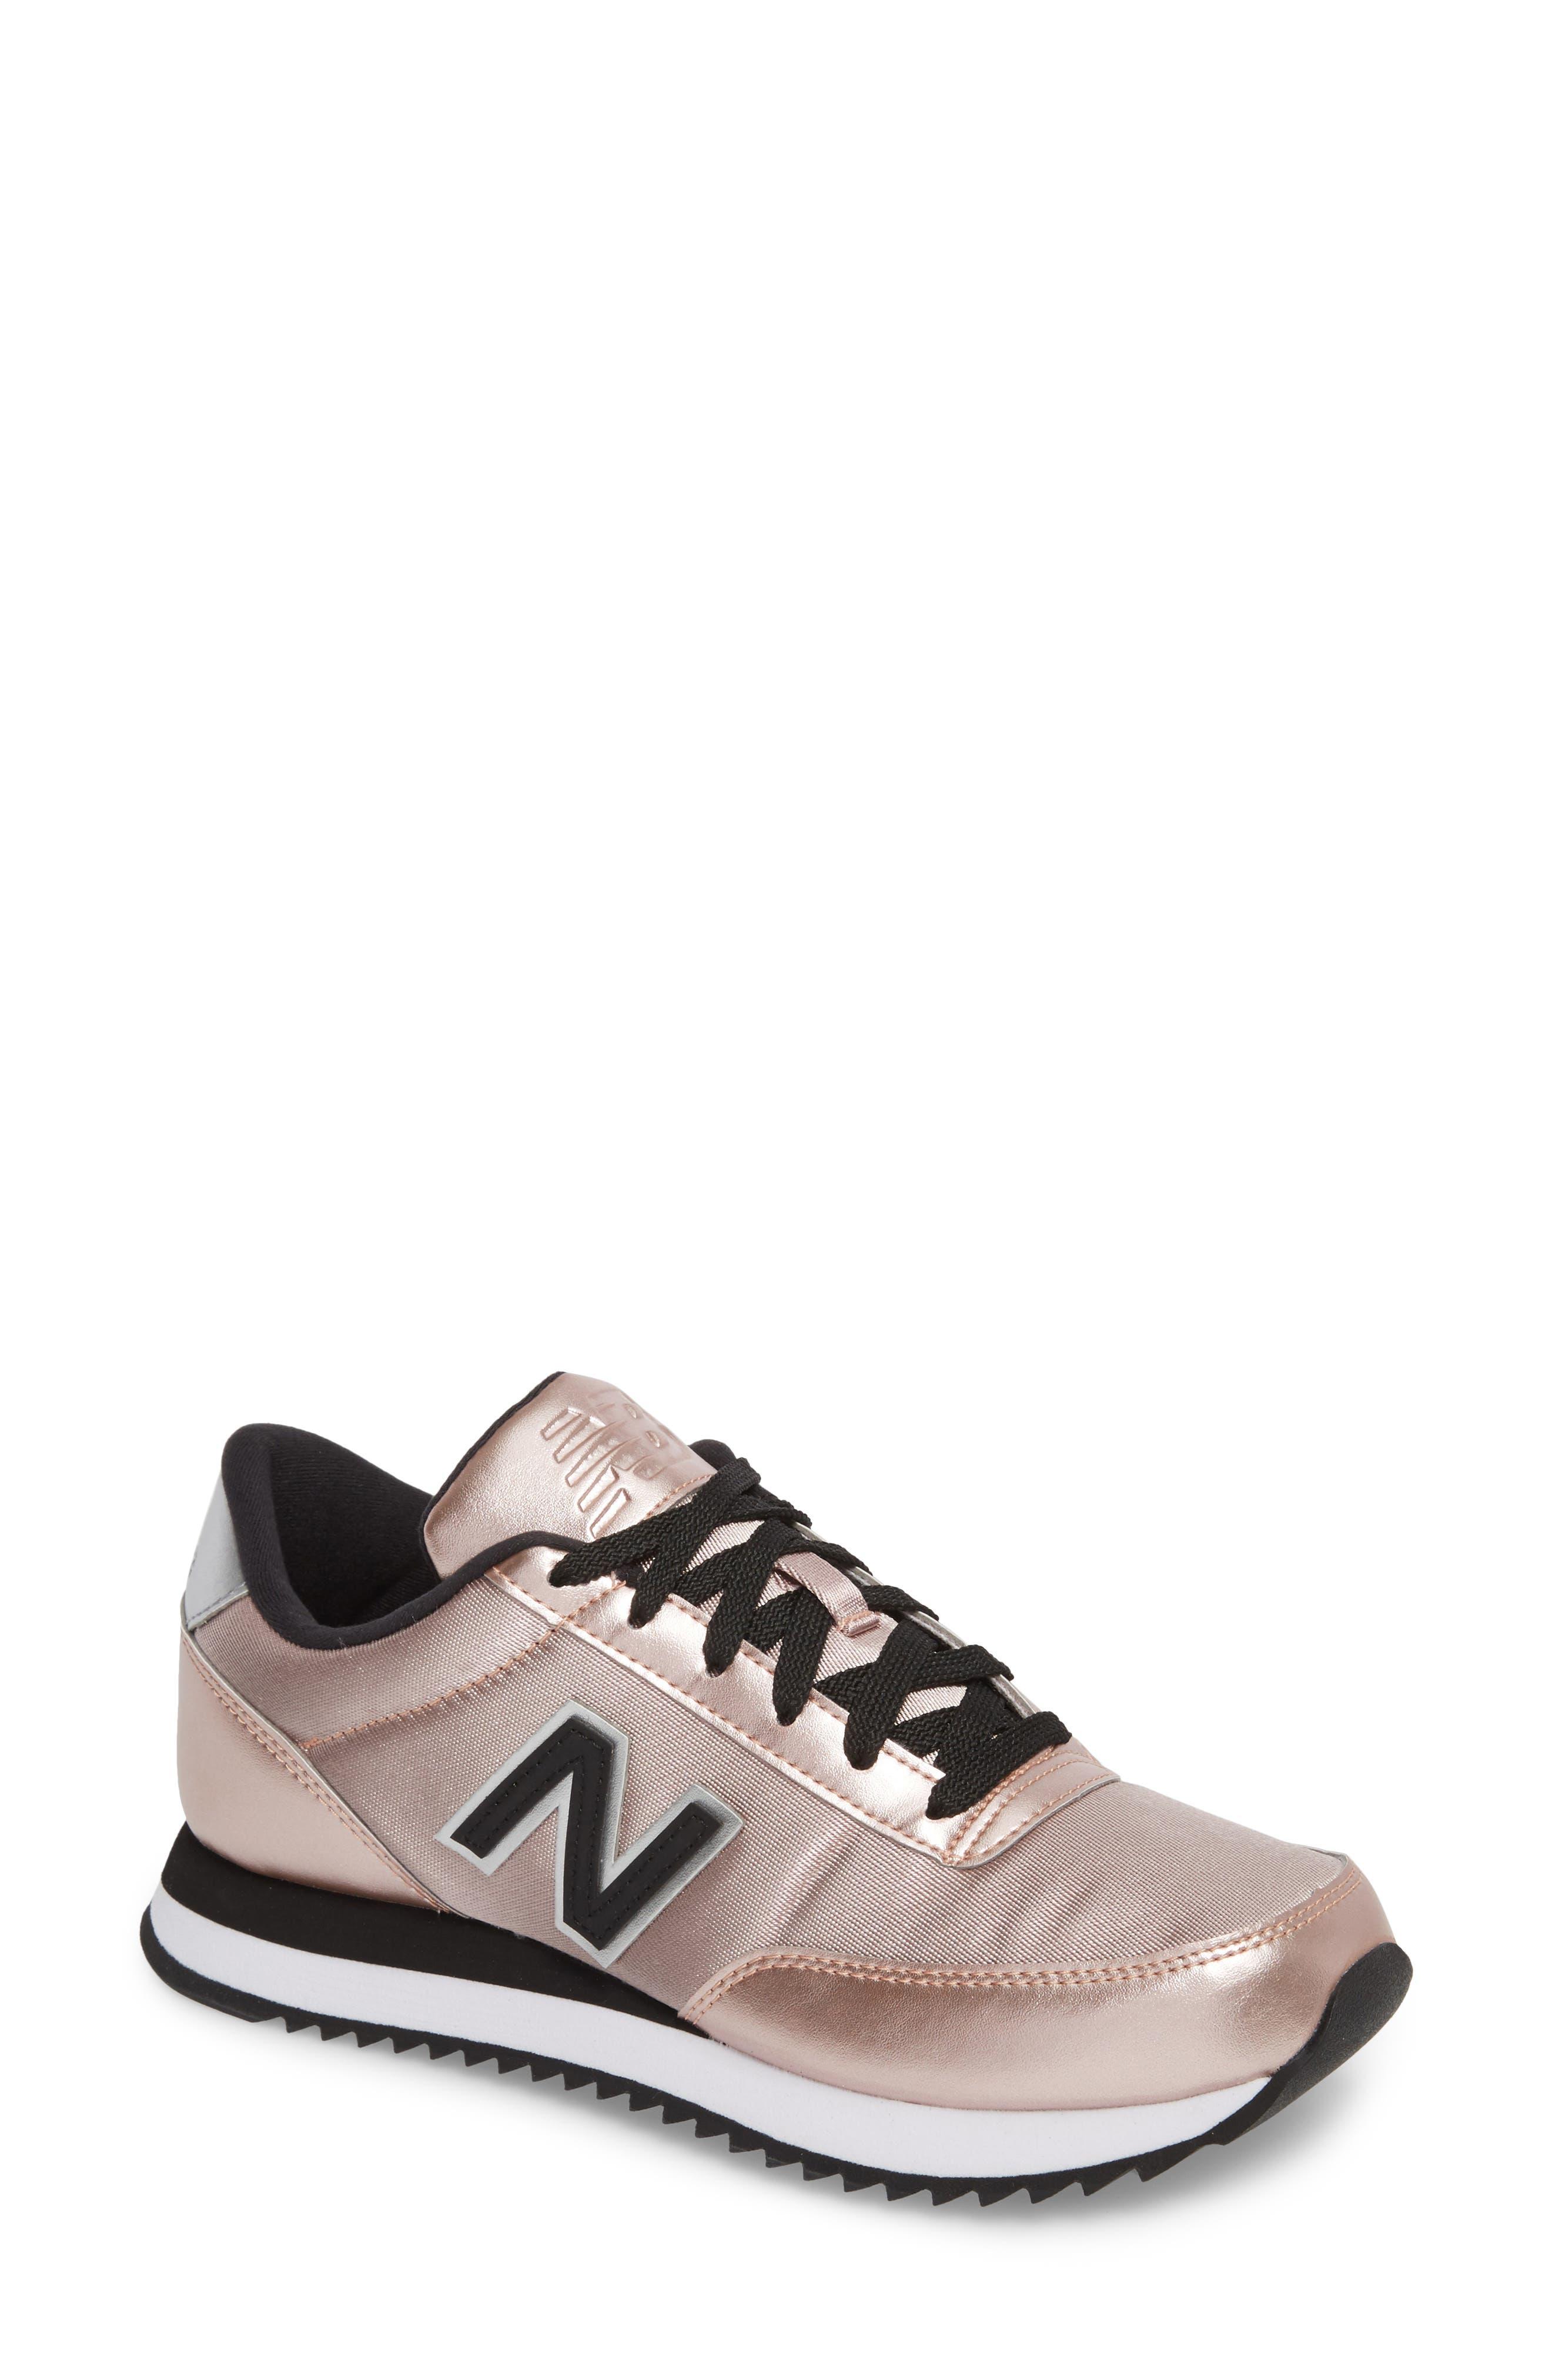 New Balance 501 Ripple Sneaker (Women)